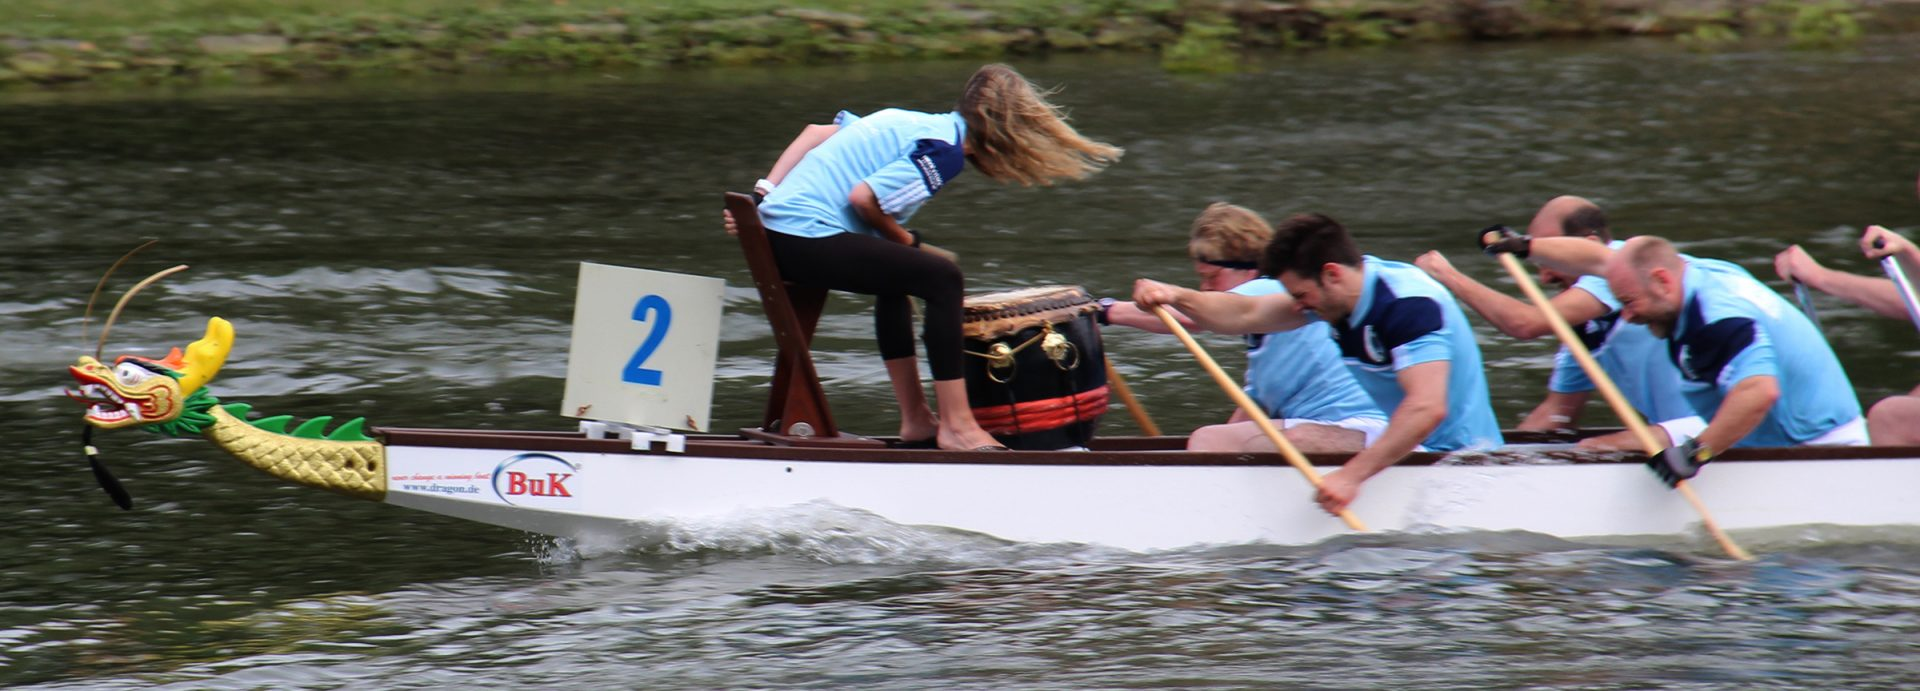 Bernd Krause Drachboot 1